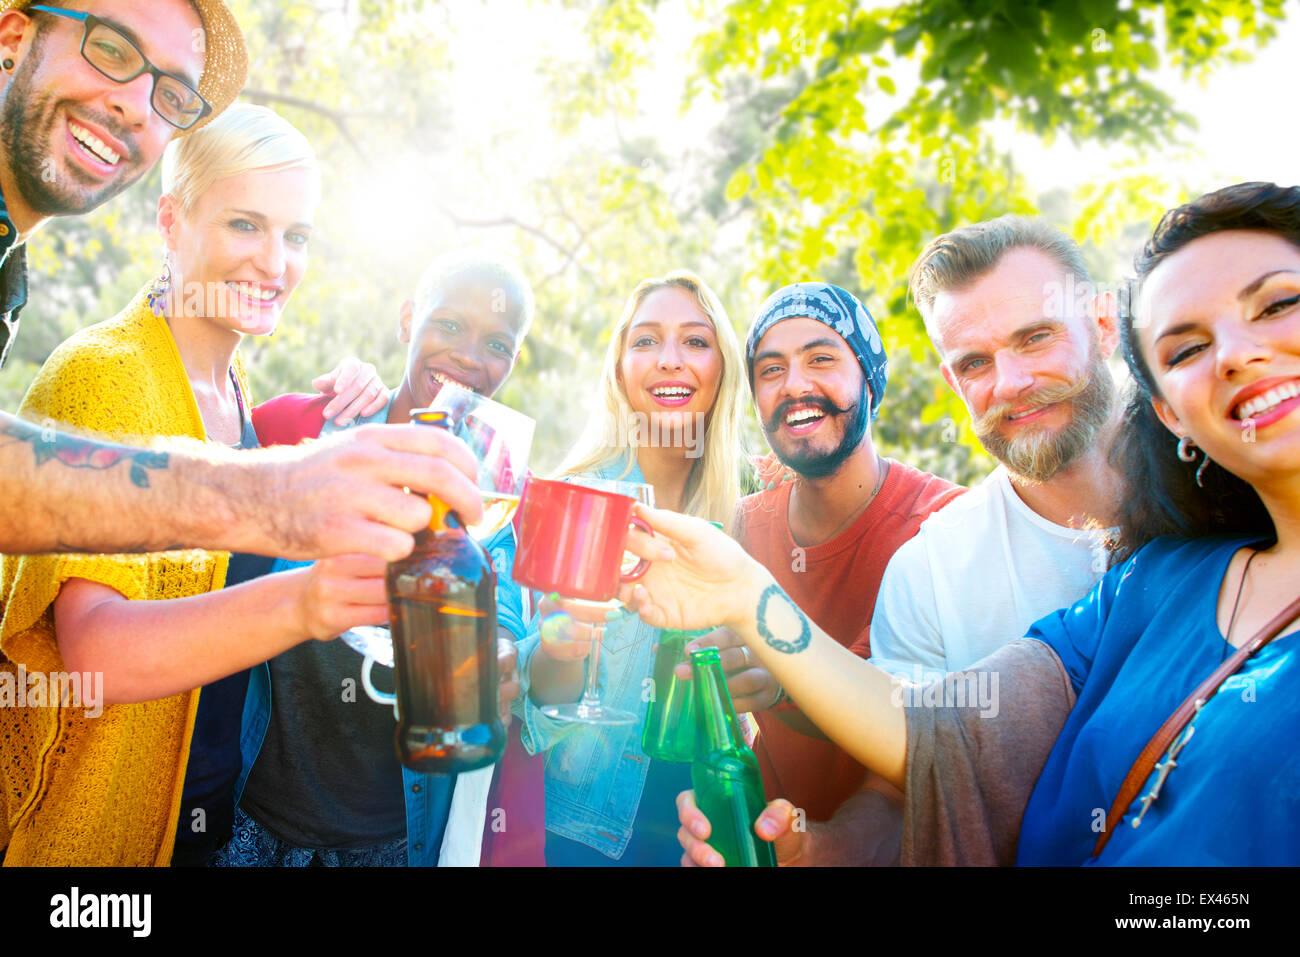 Ami célébrer vie joyeux pique-nique Party Concept Potable Photo Stock